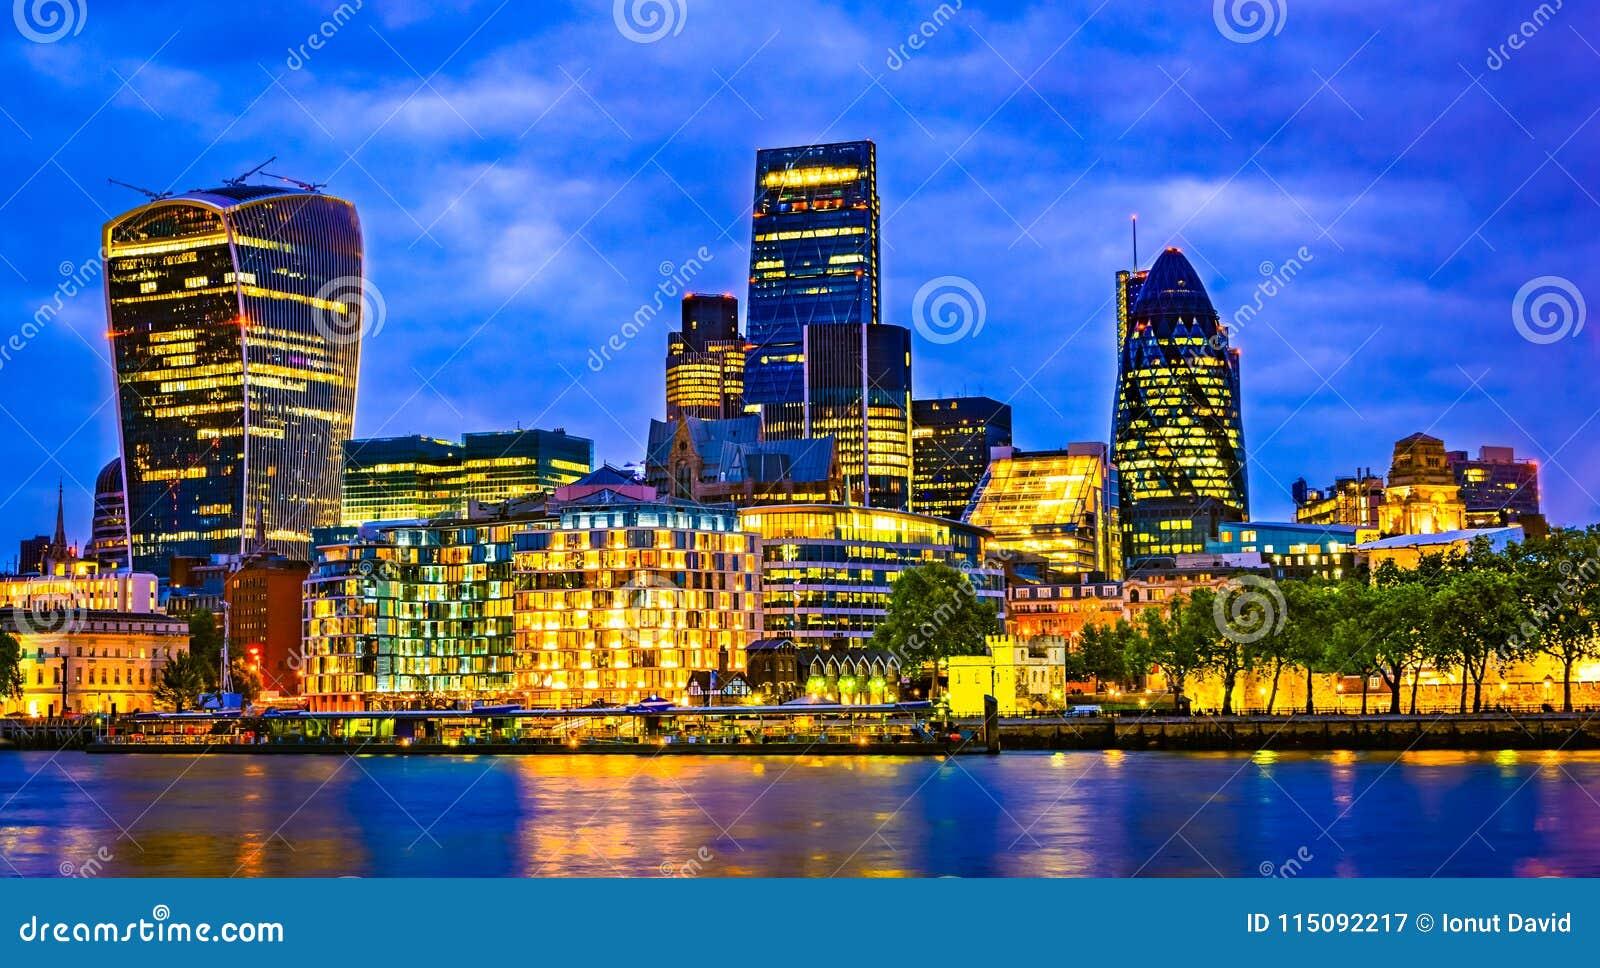 London Storbritannien, UK: Cityscape runt om Southwark, Thames River